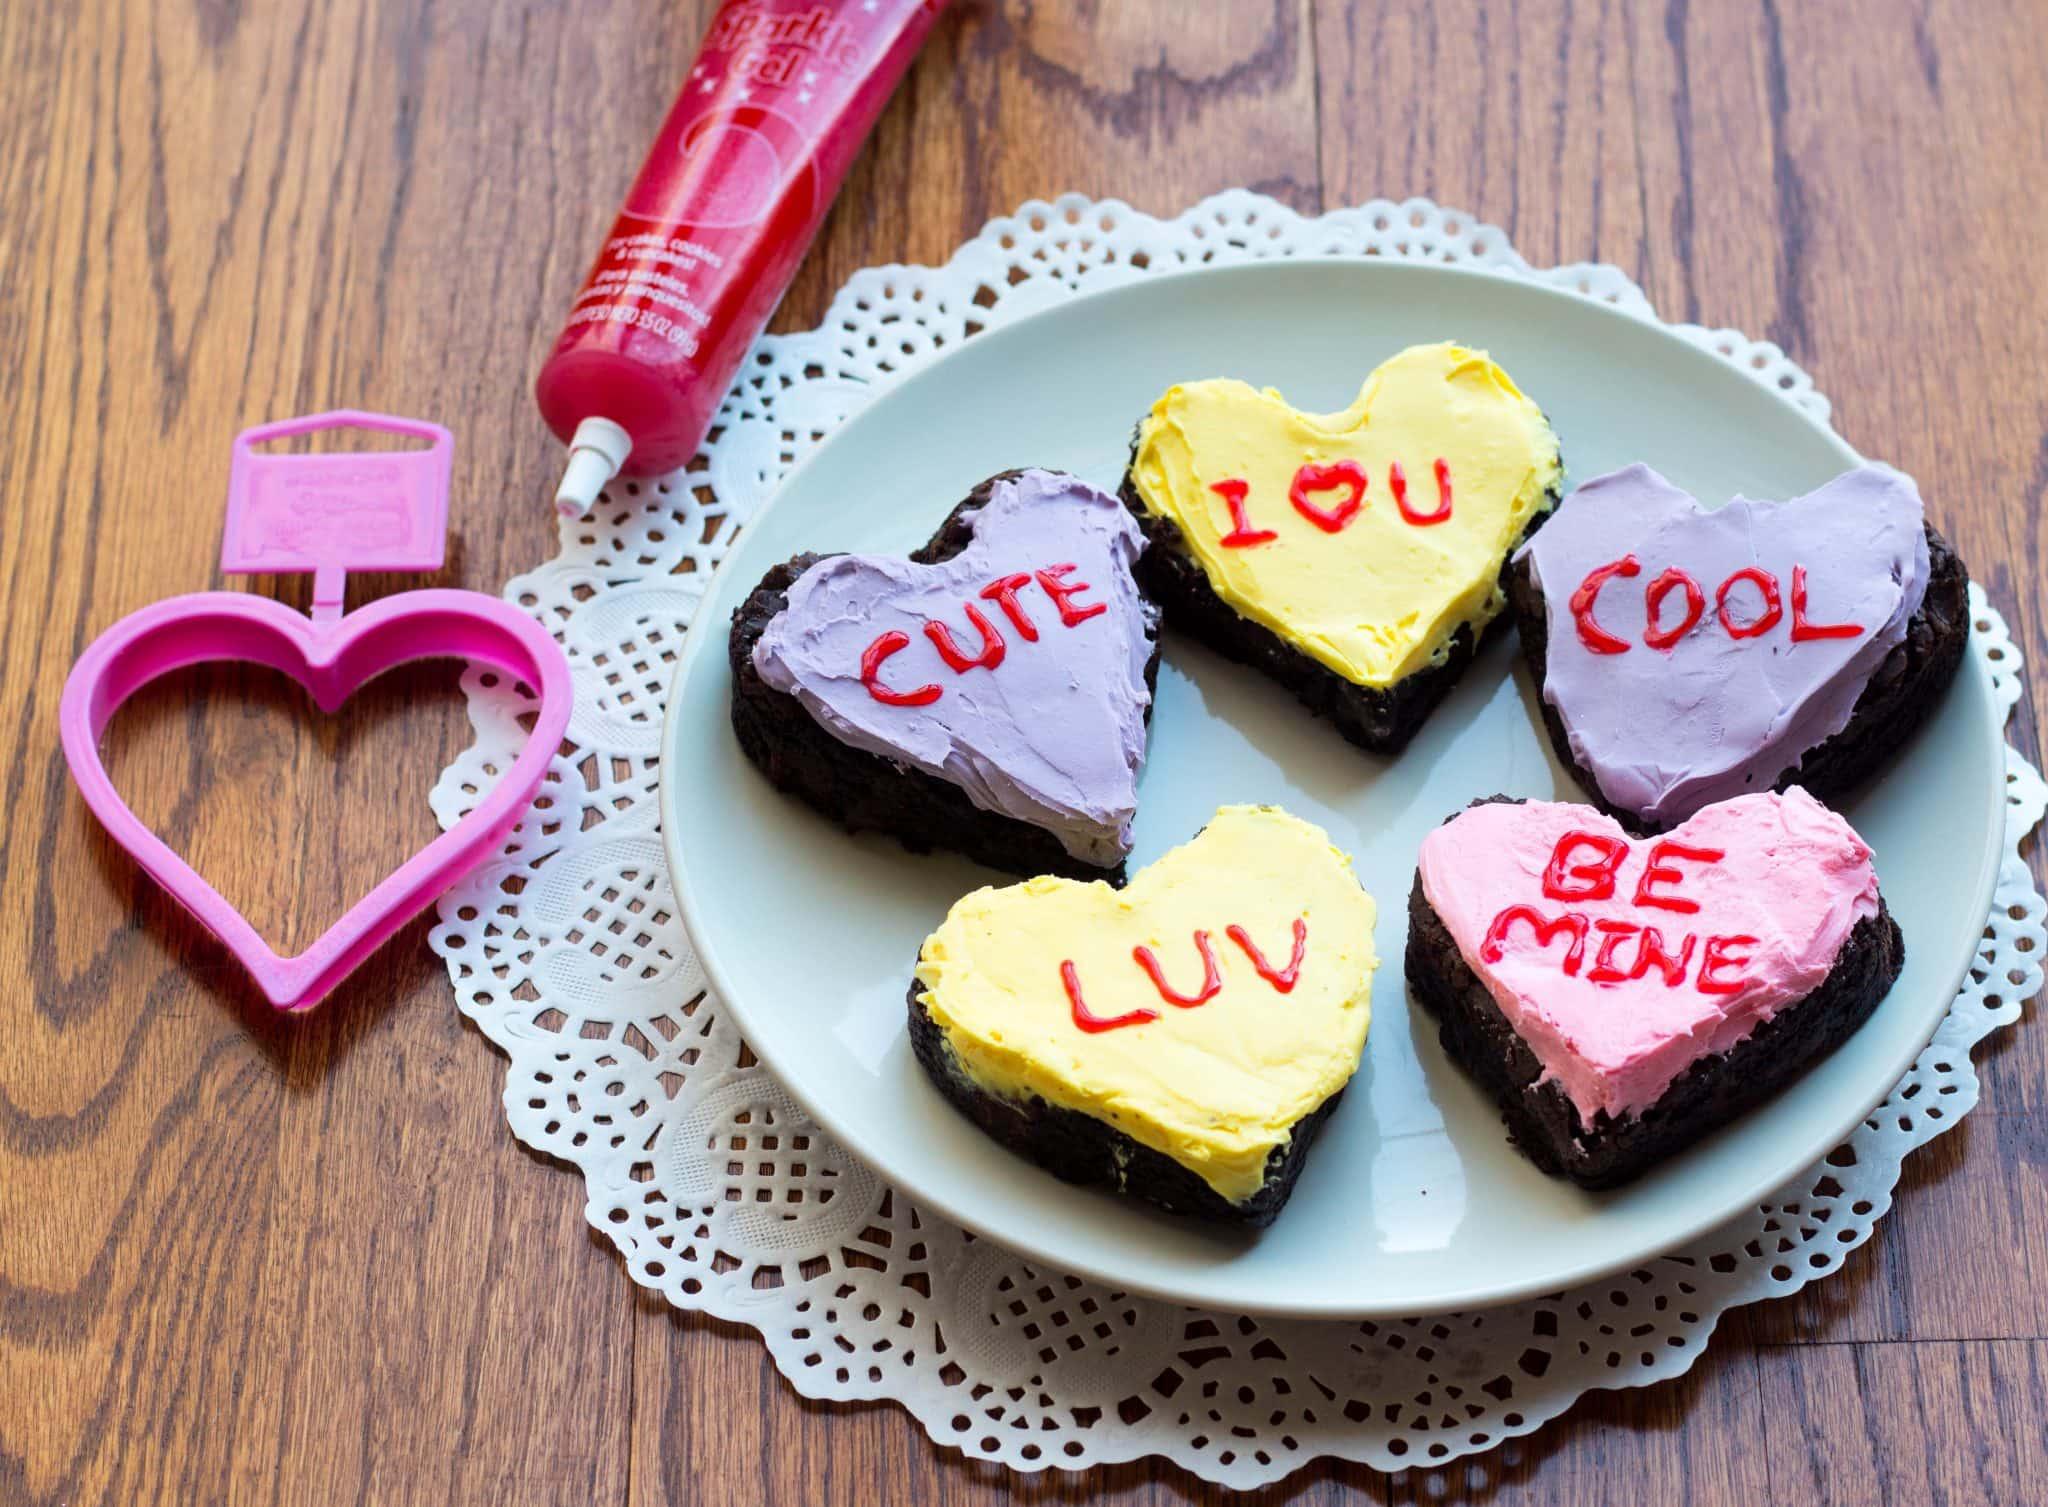 Conversation Heart Chocolate Brownies